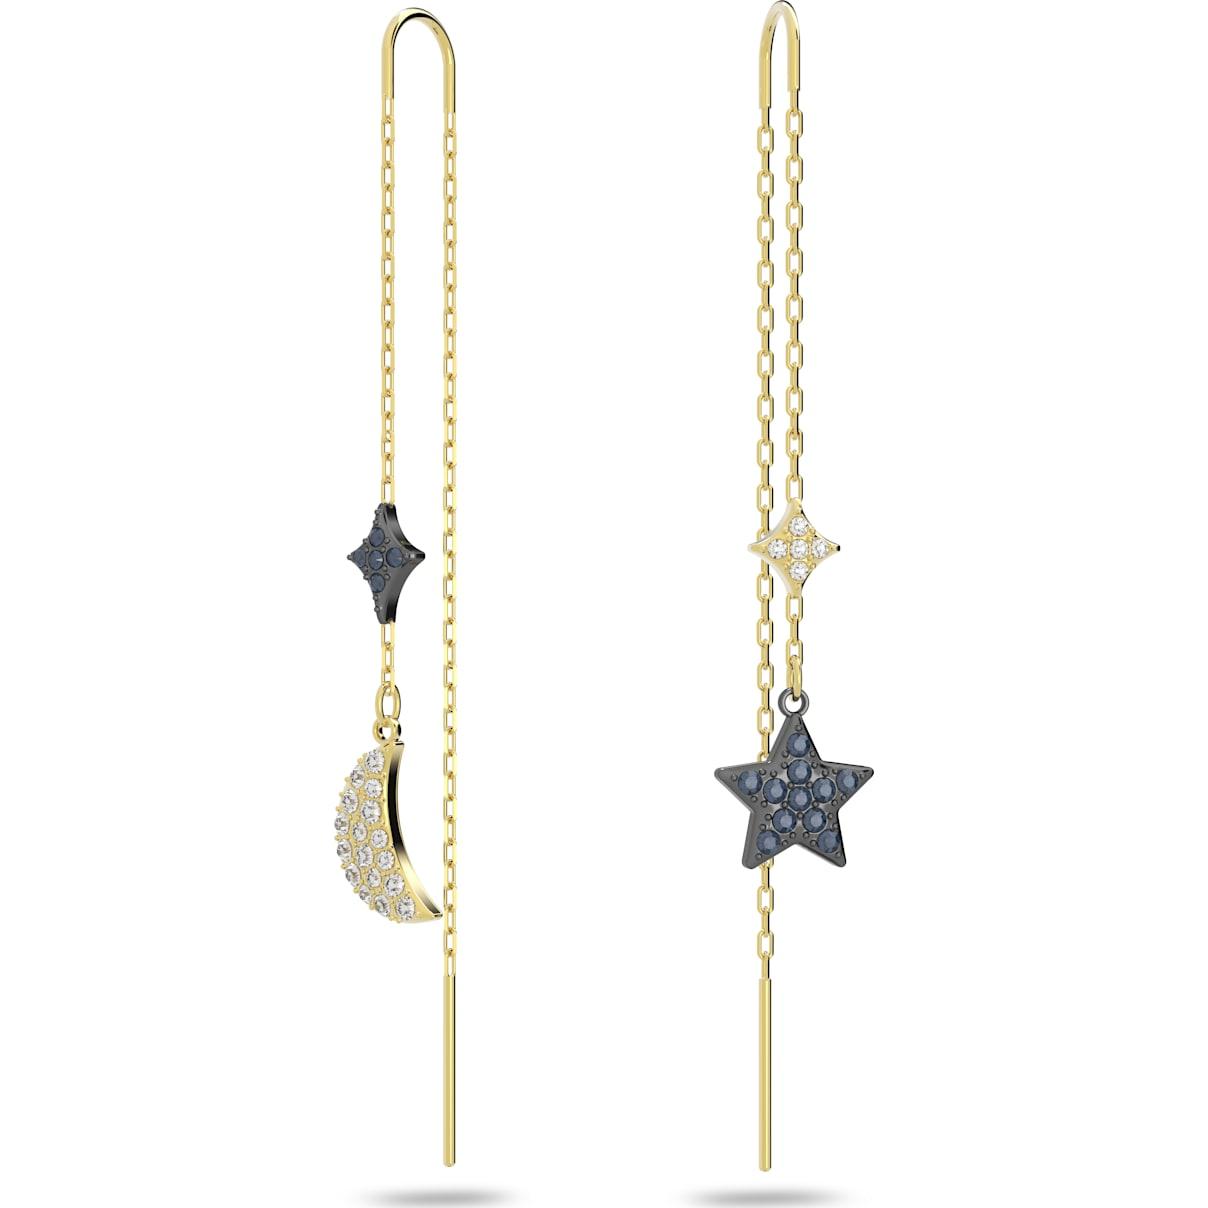 Swarovski Swarovski Symbolic Moon Pierced Earrings, Teal, Mixed metal finish